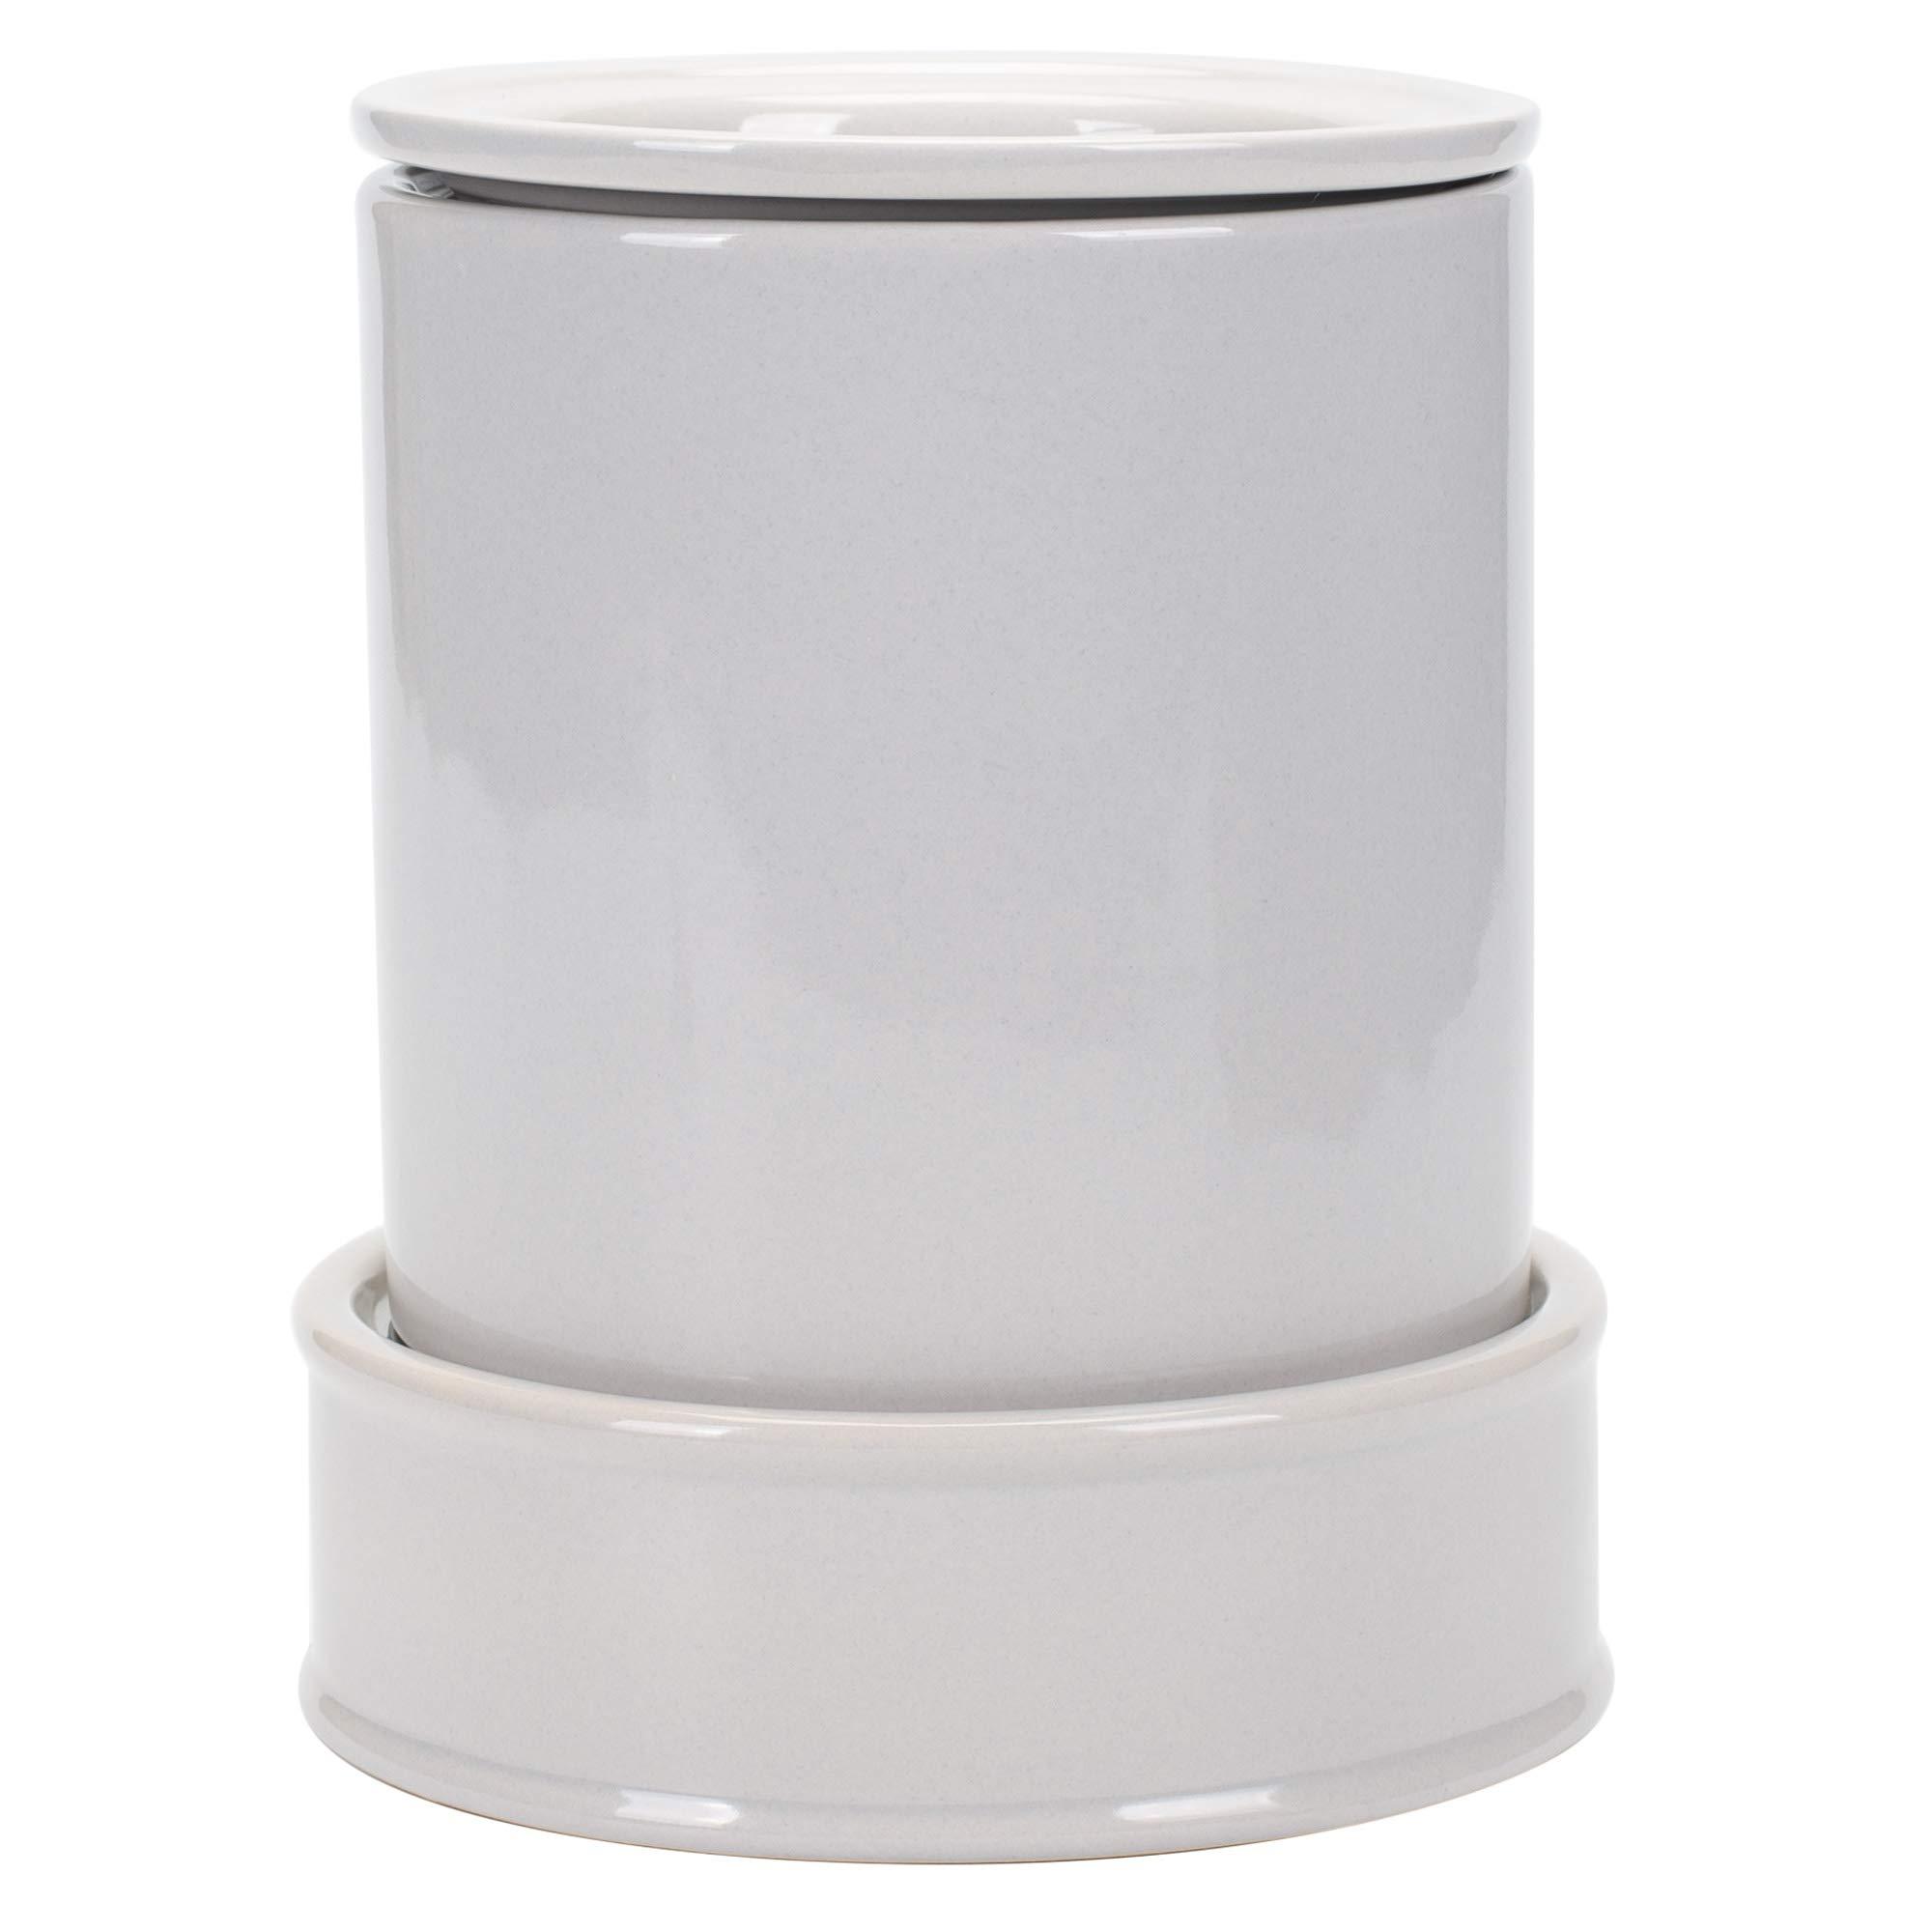 Grey Ceramic Stoneware Electric Hot Cold 3 Piece Serving Duo Dipper Warming Pot Dish Set